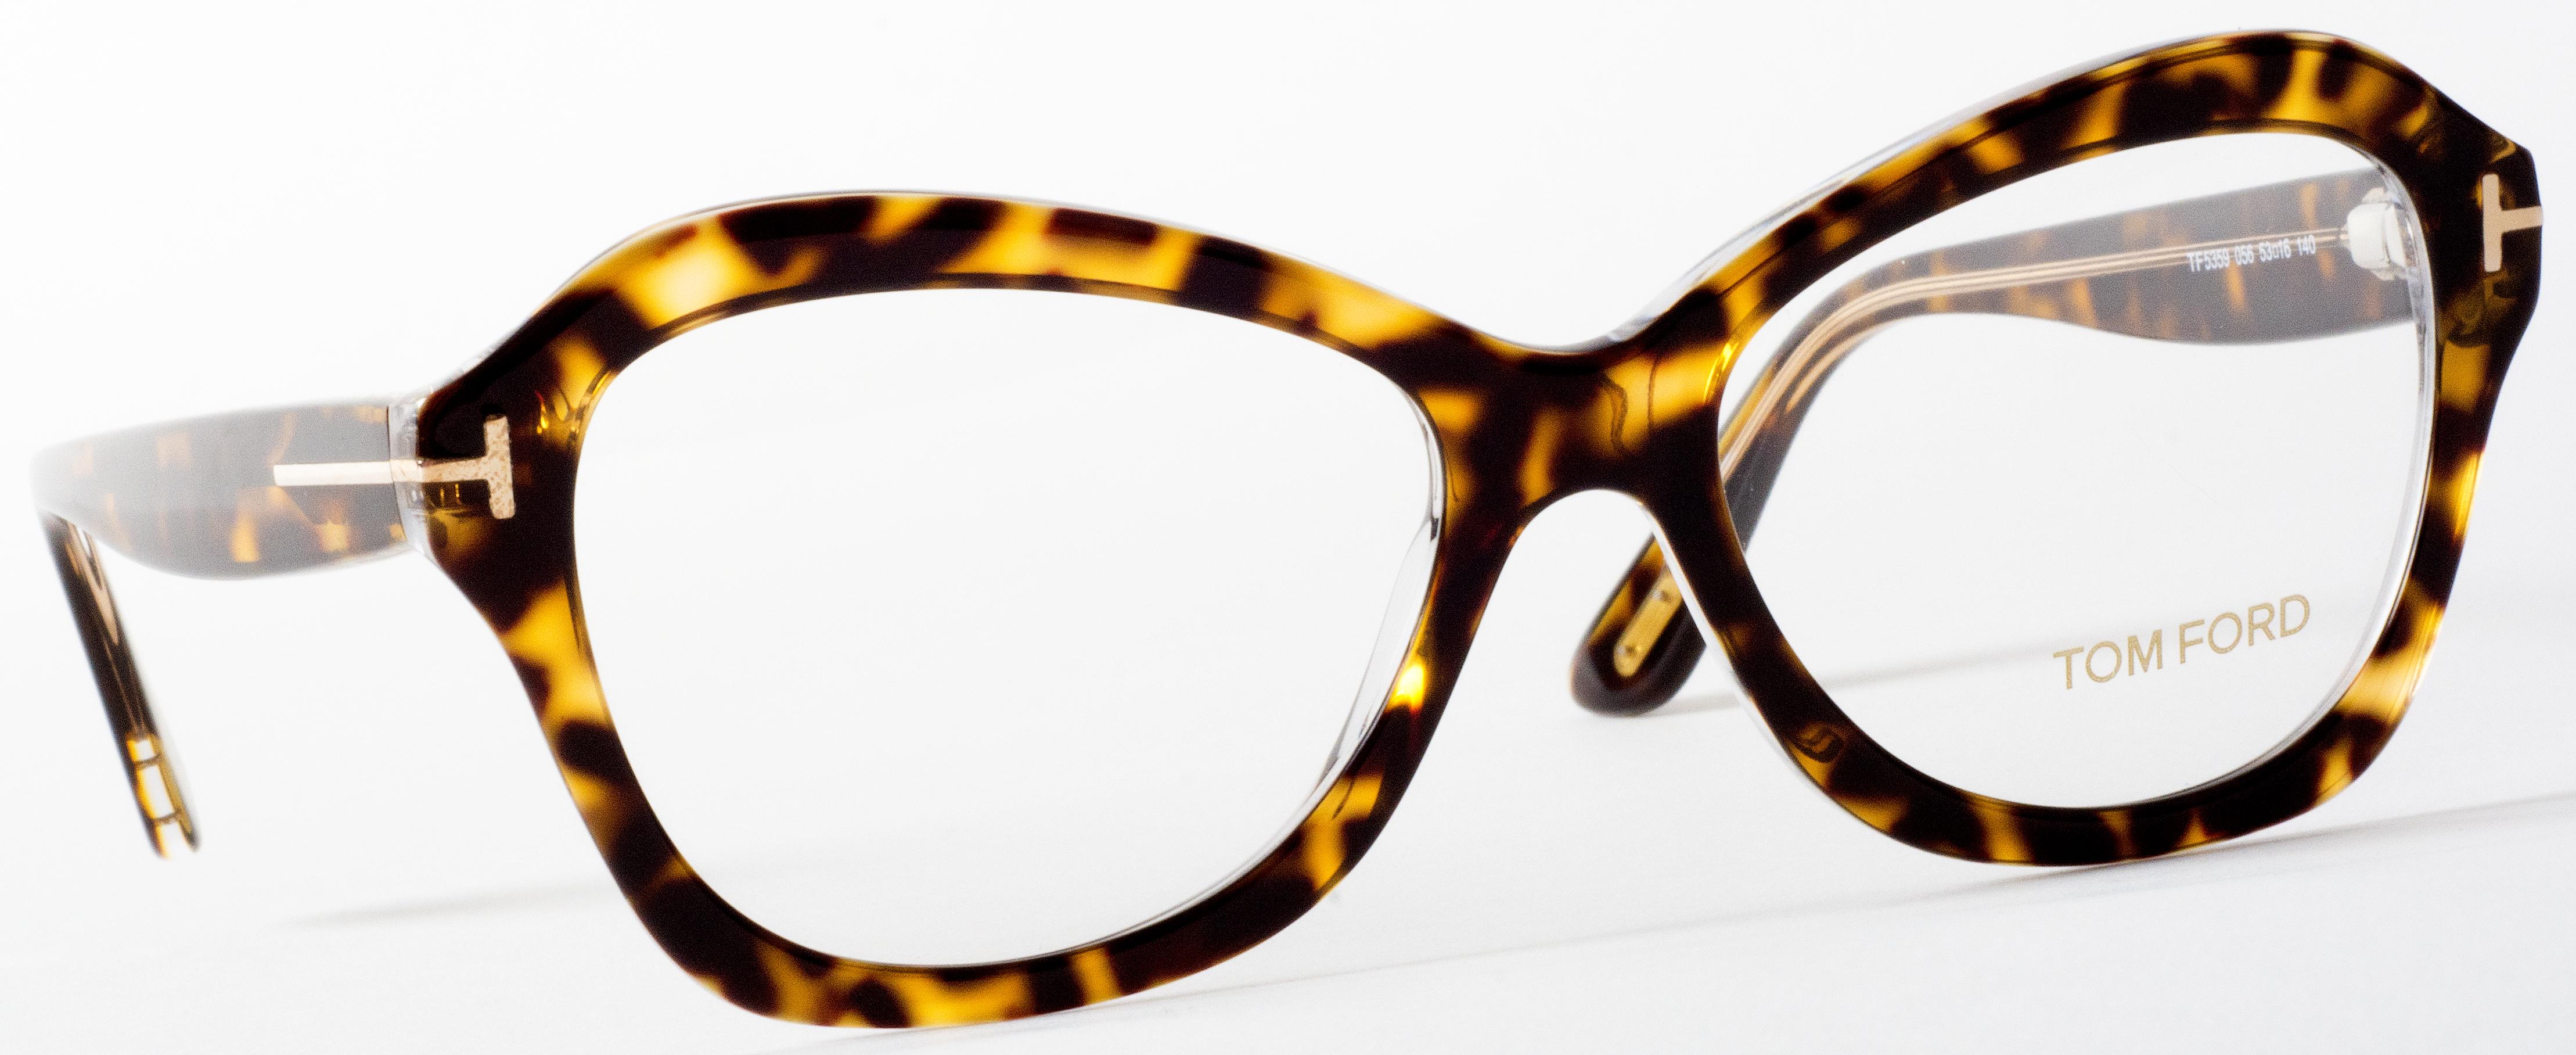 Titanium Flexible Eyeglass Frames Reviews  AliExpresscom